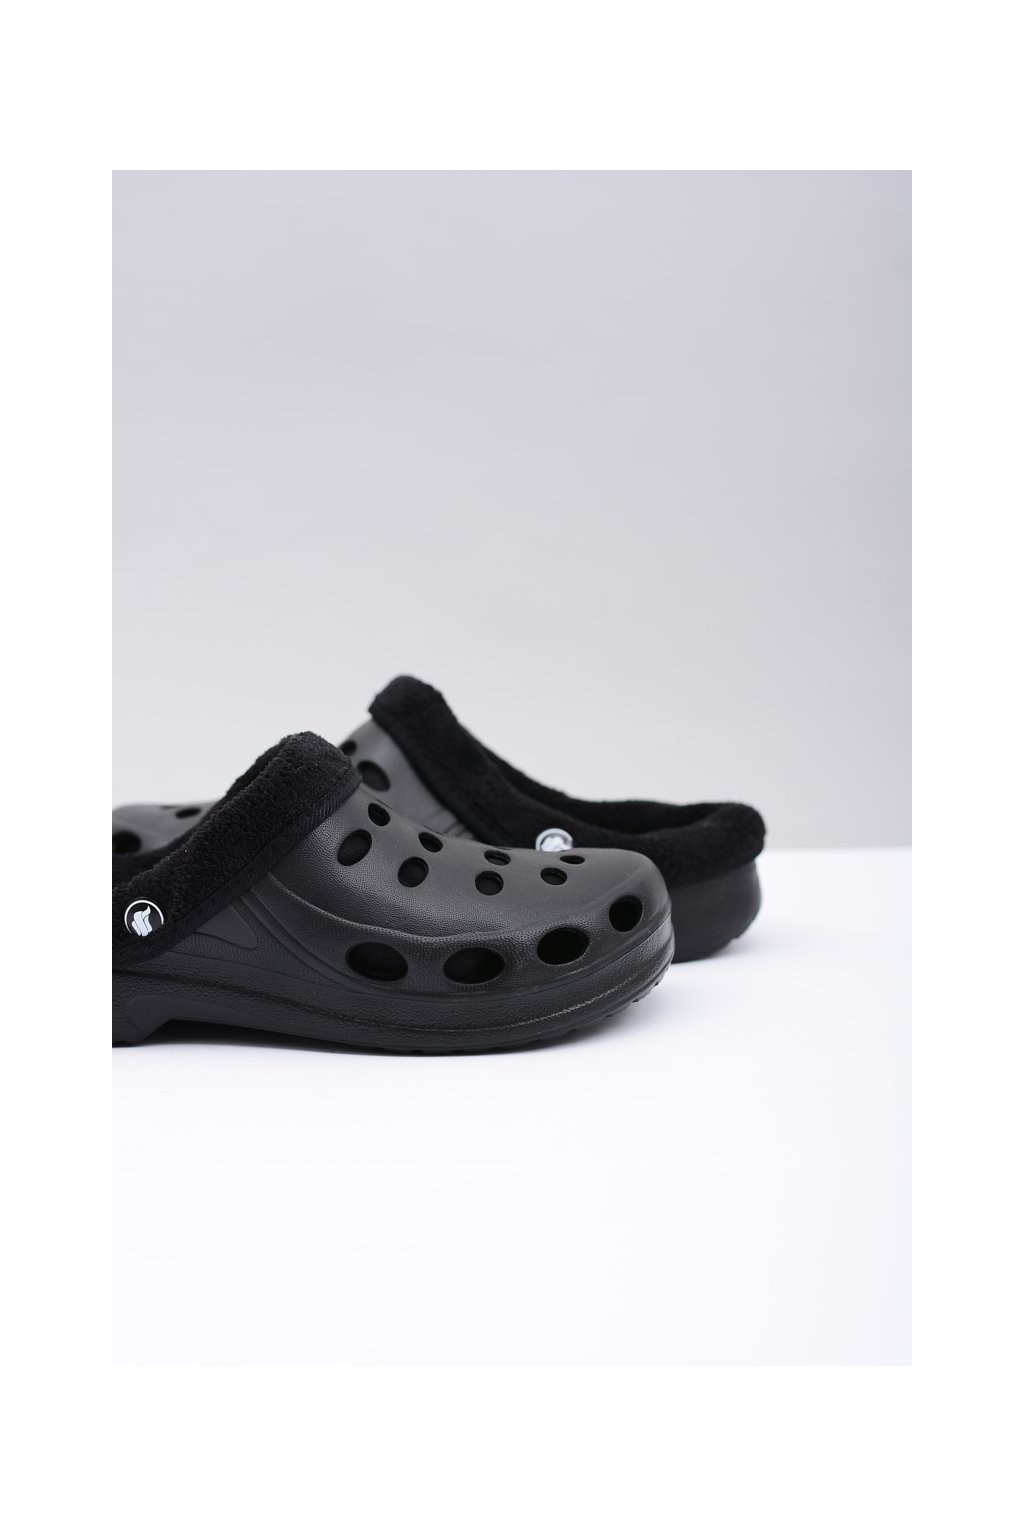 pánske Klasické šľapky Sandále Teplé čierne Crocsy EVA